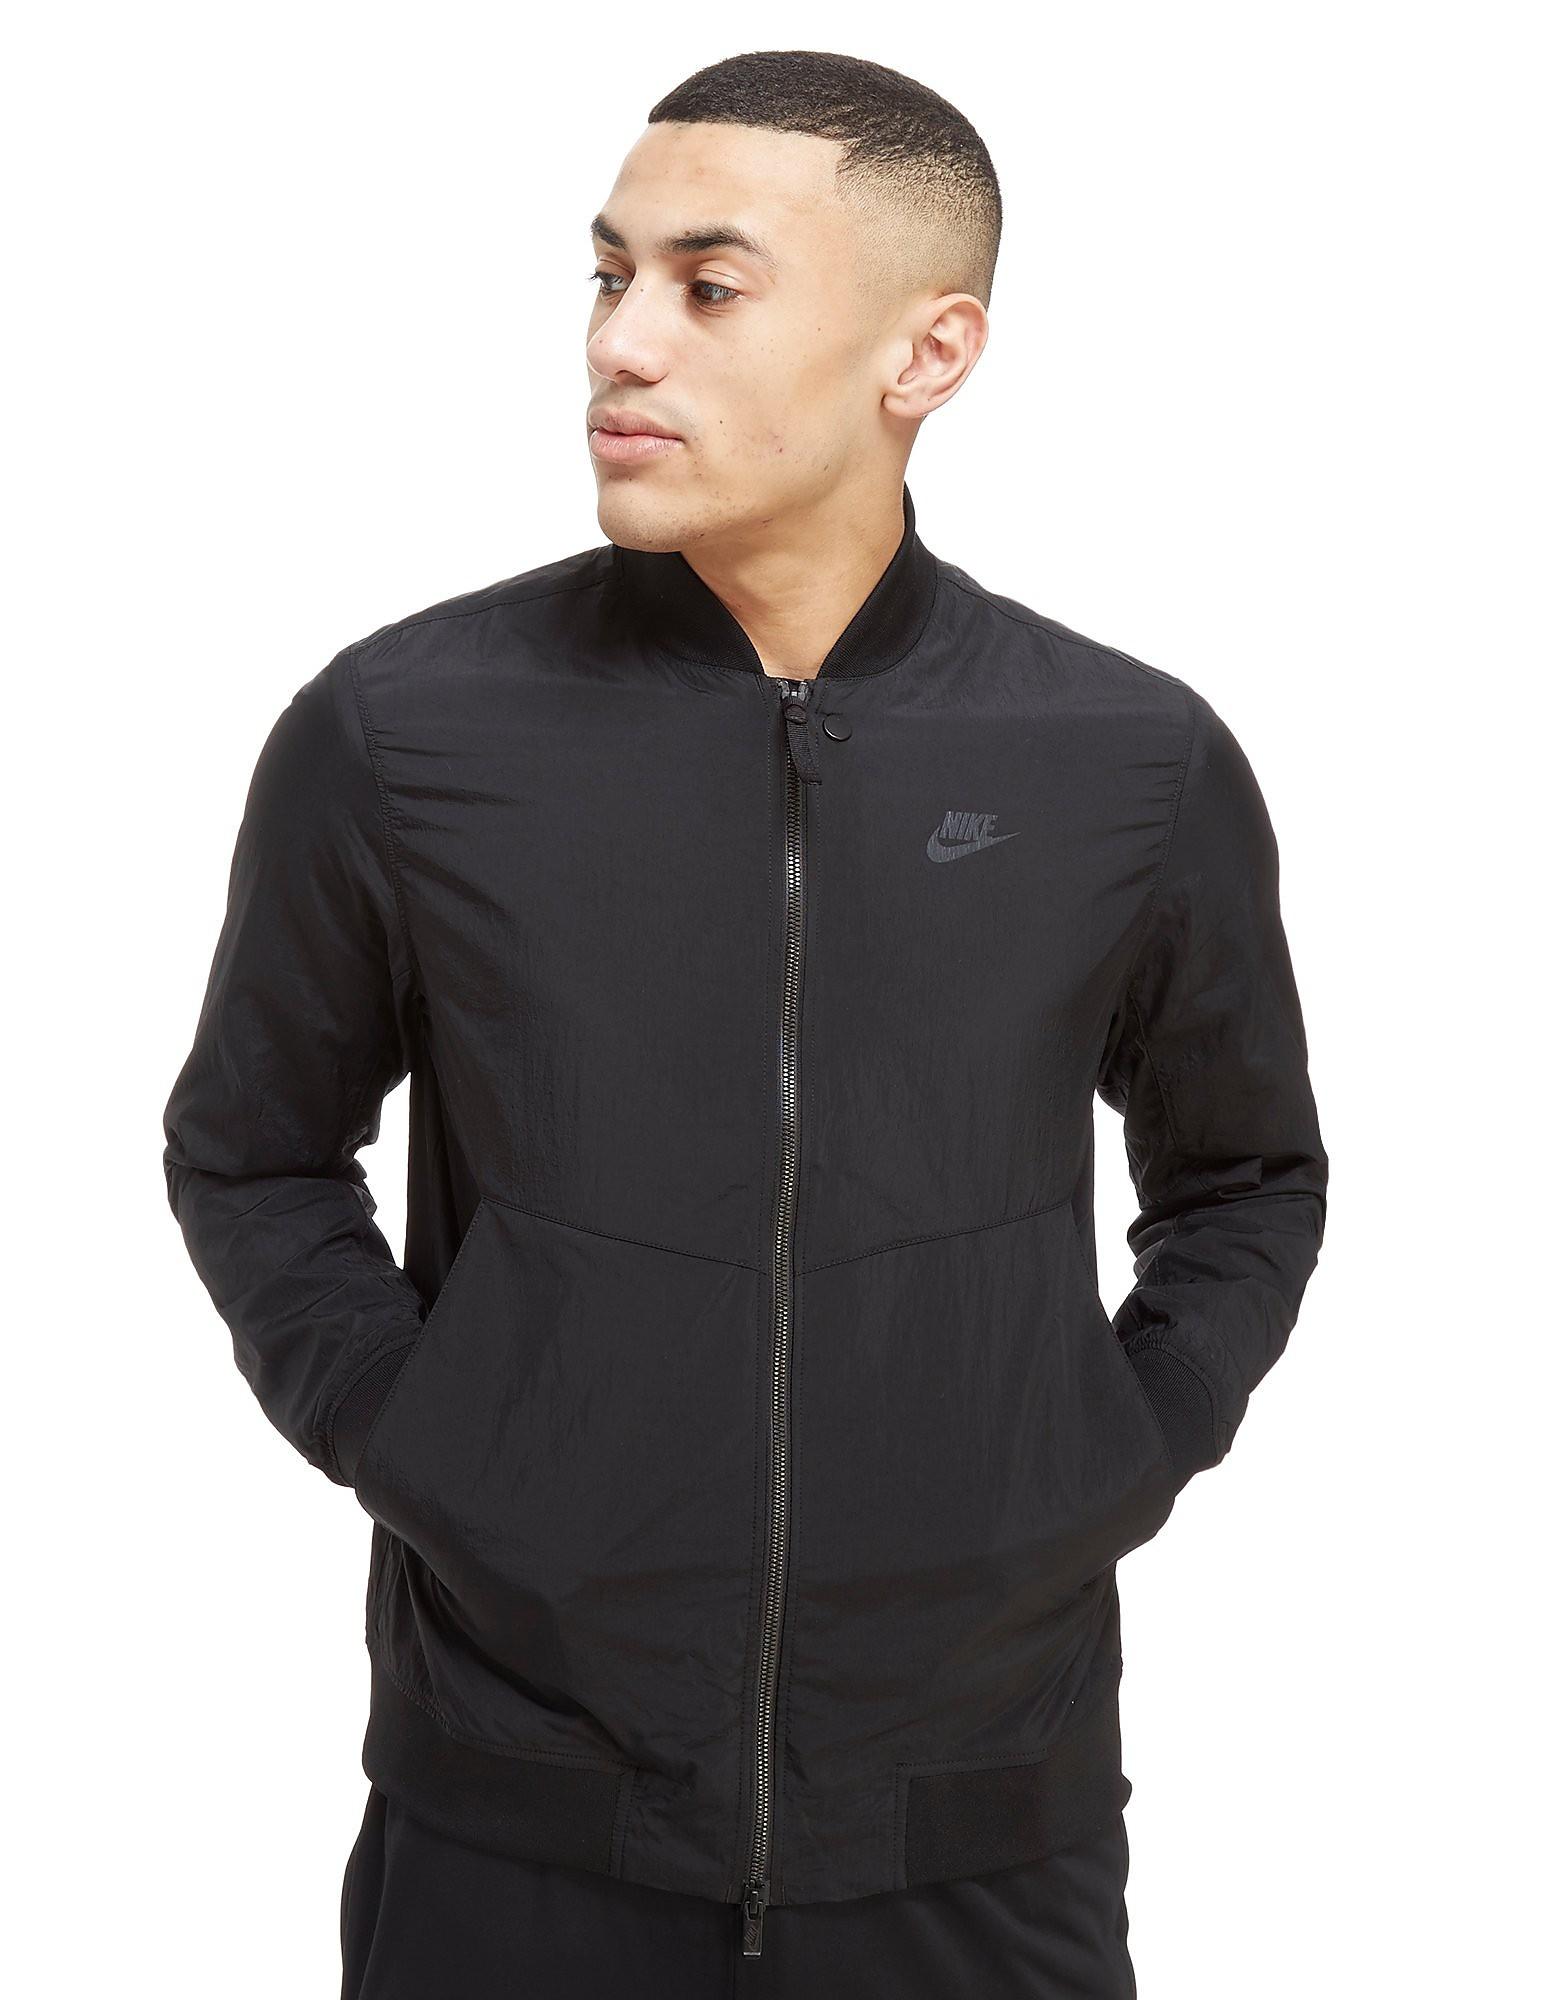 Nike Woven Varsity Jacket